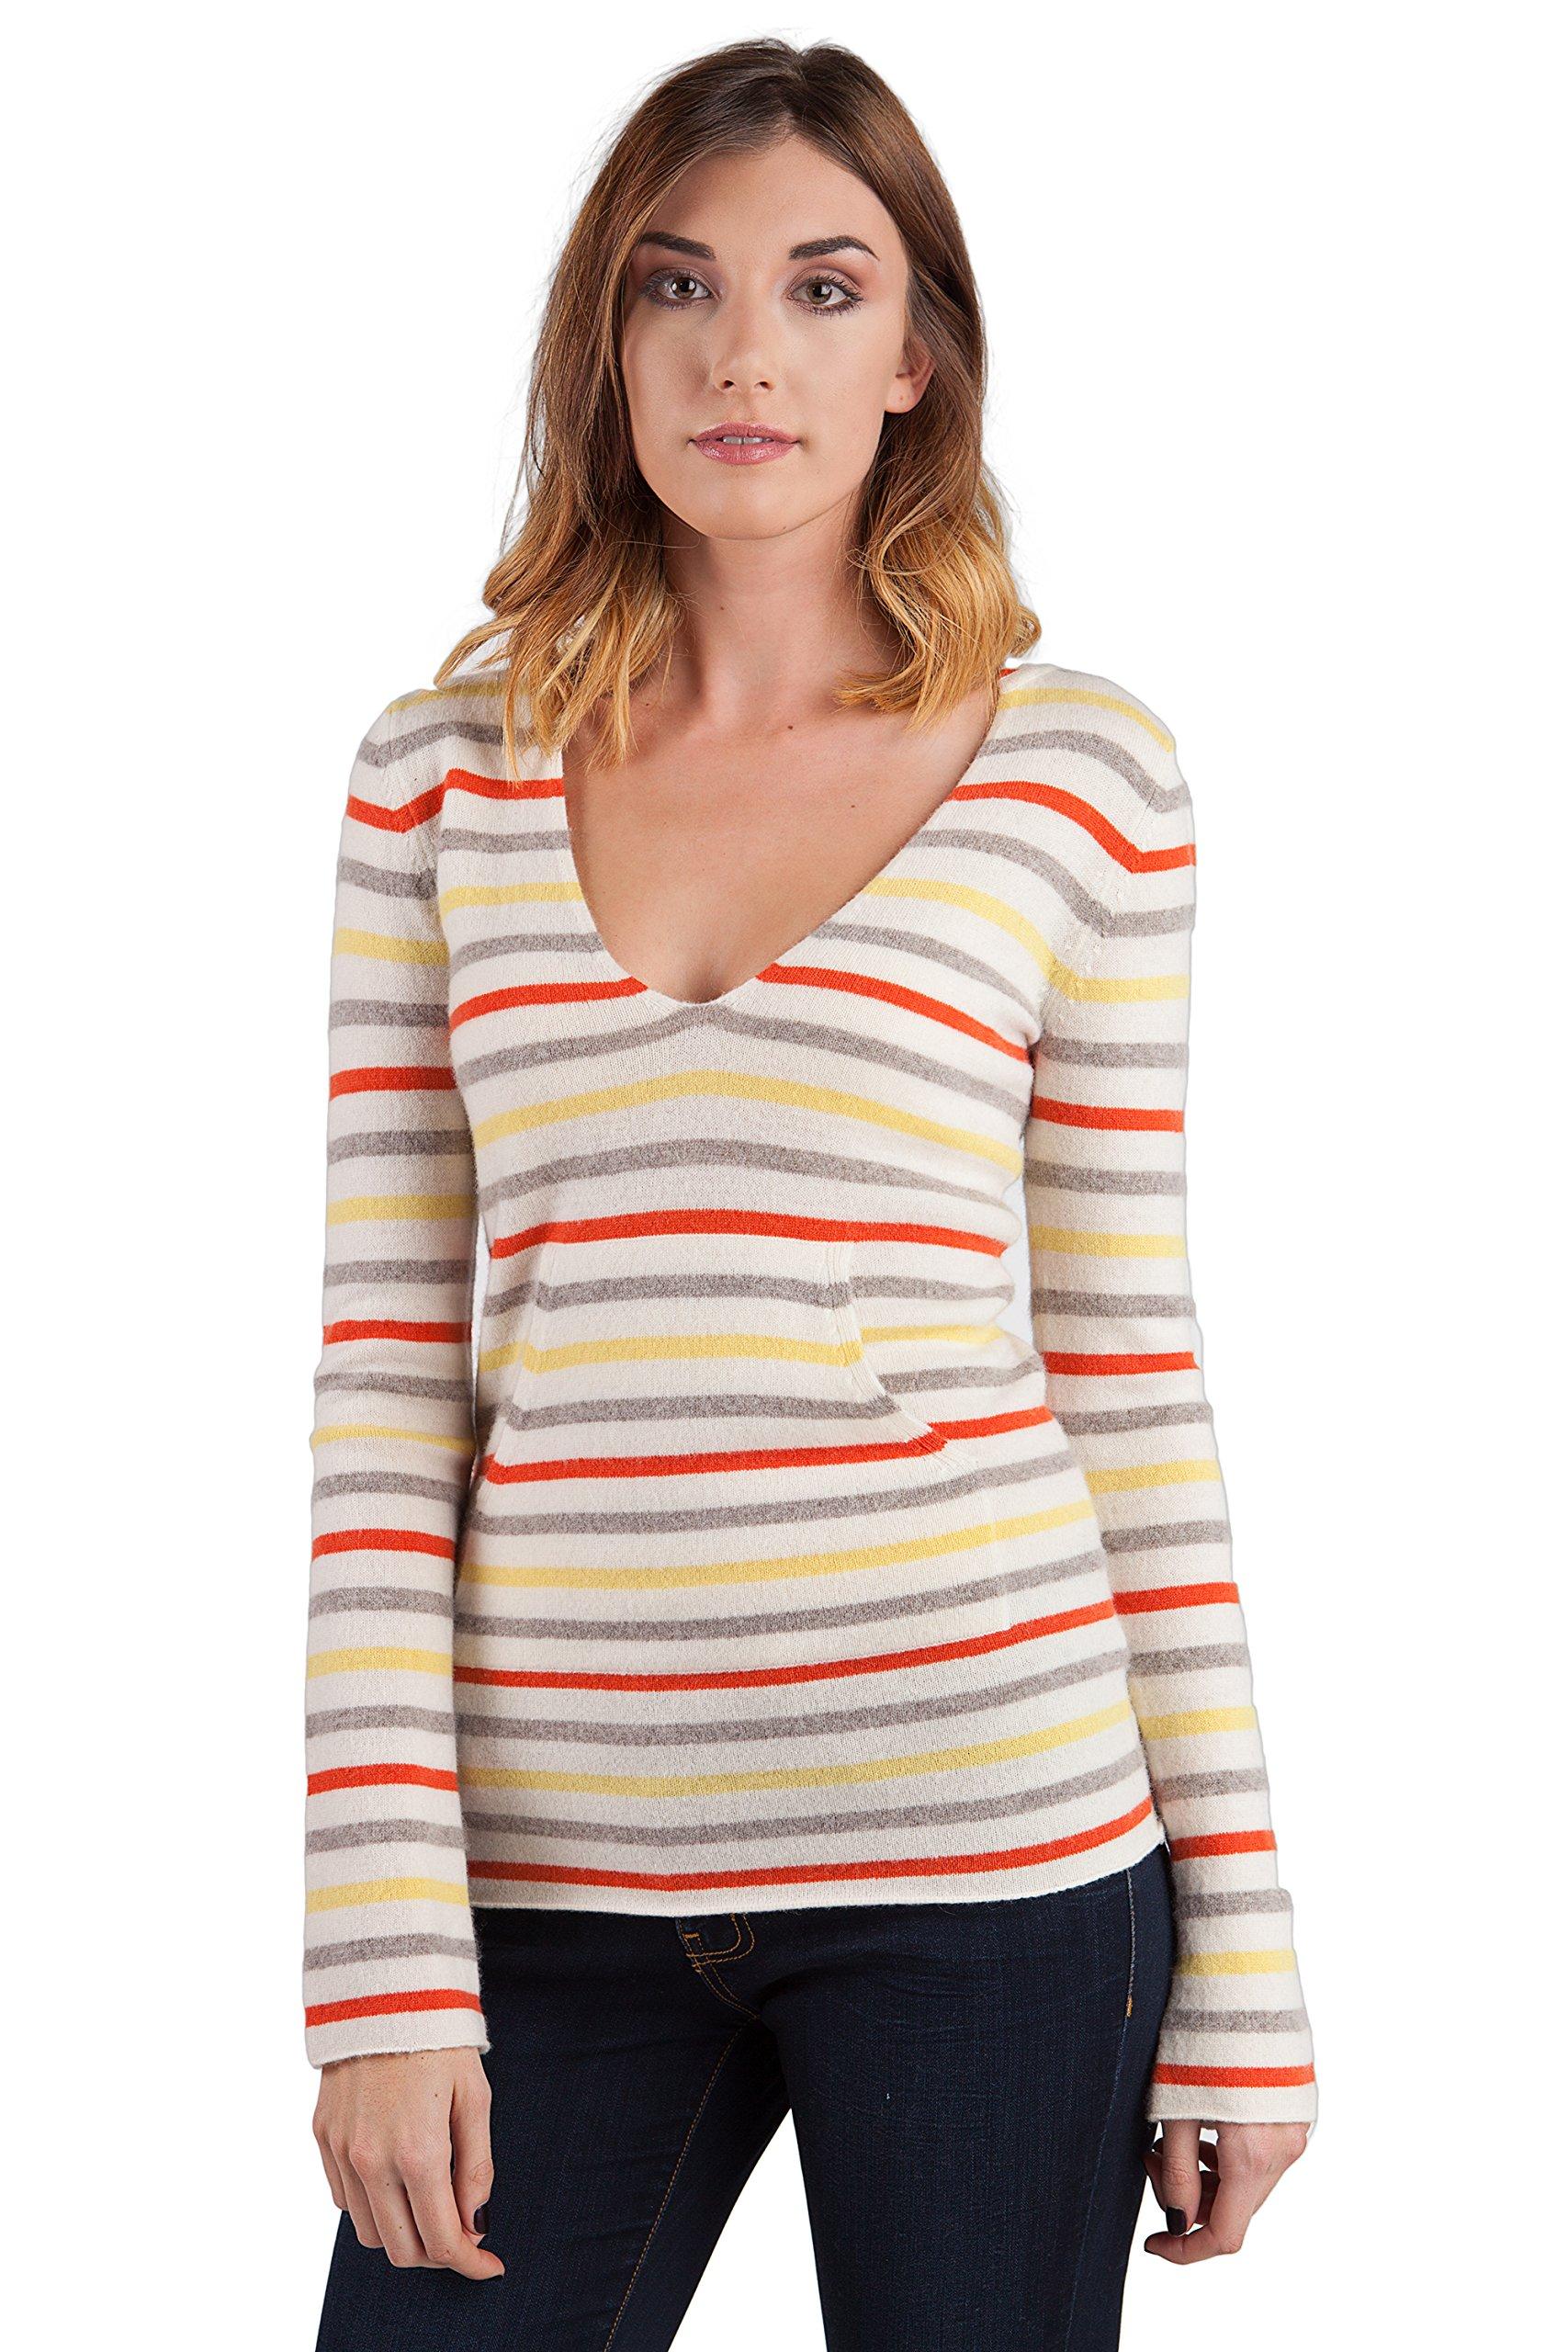 JENNIE LIU Women's 100% Cashmere Long Sleeve V Neck Contemporary Cashmere Hoodie (M, Lemon Stripe)